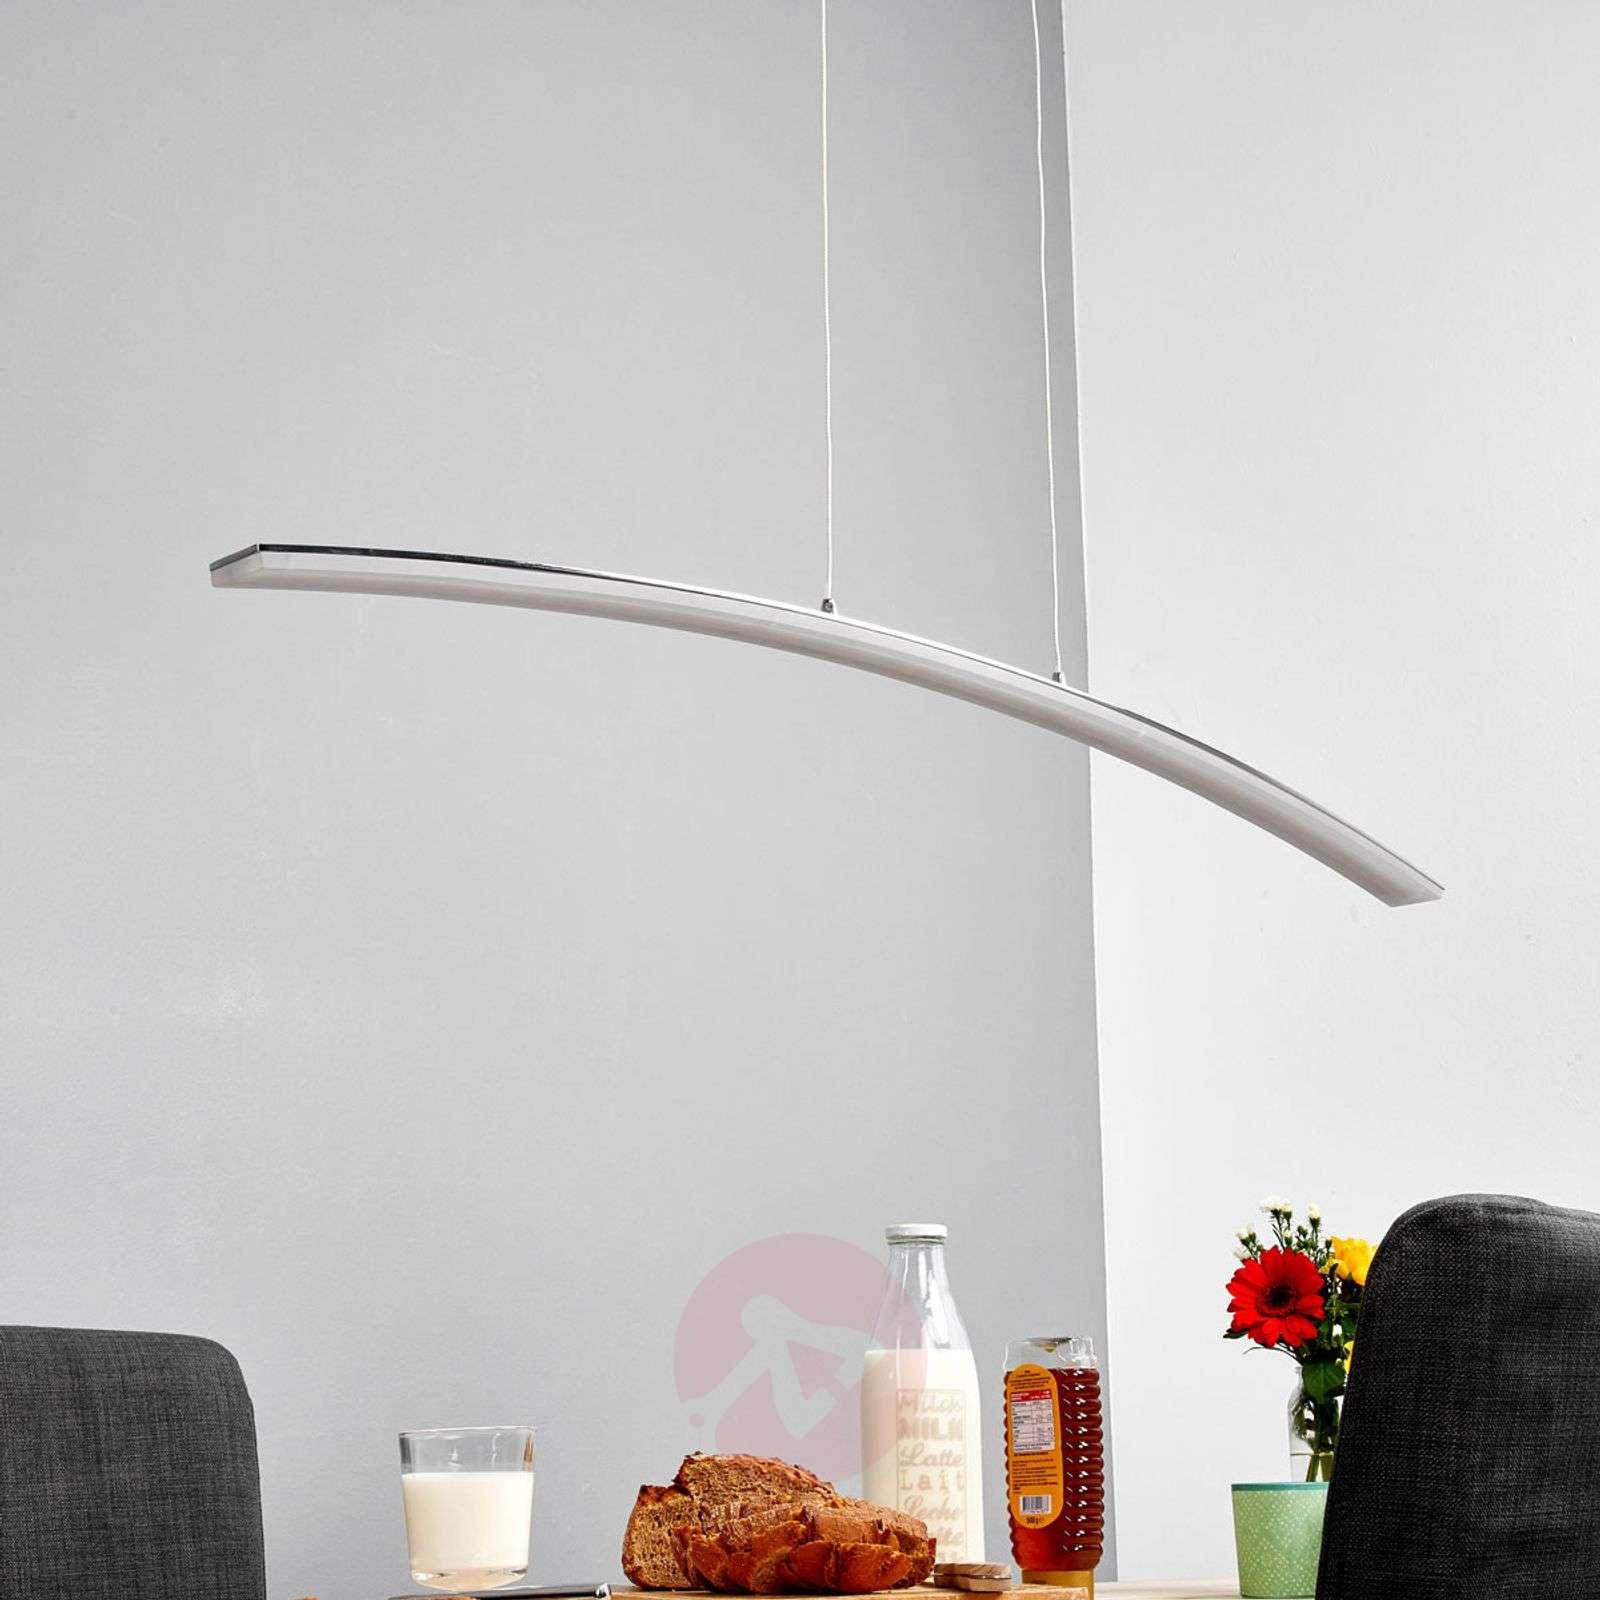 Lorian curved LED pendant light-9984008-01